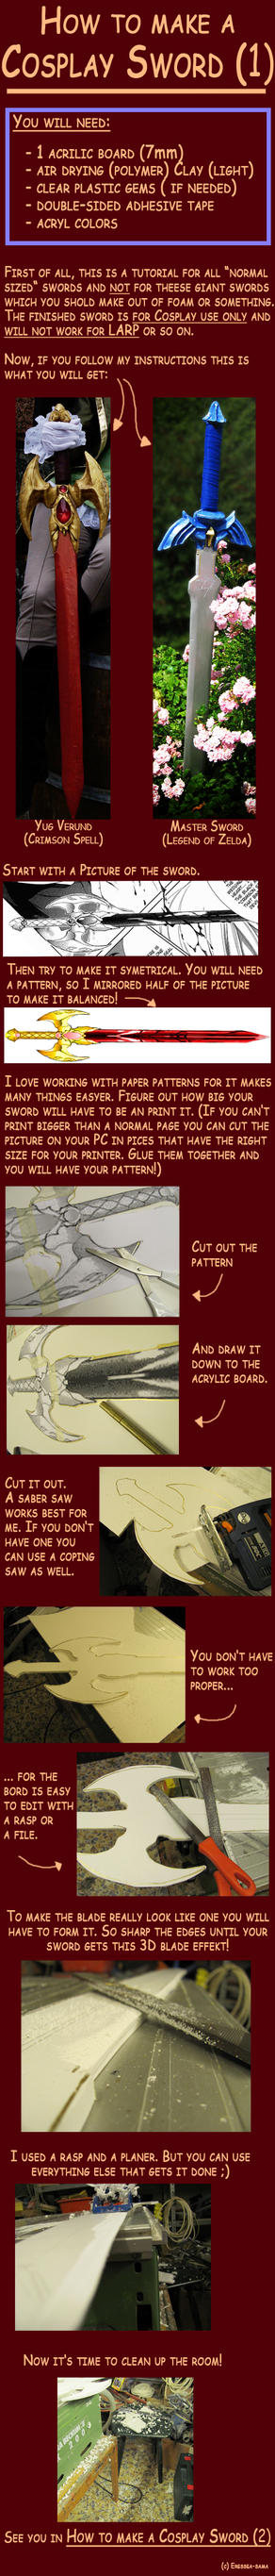 How to make a Cosplay Sword 1 by Eressea-sama